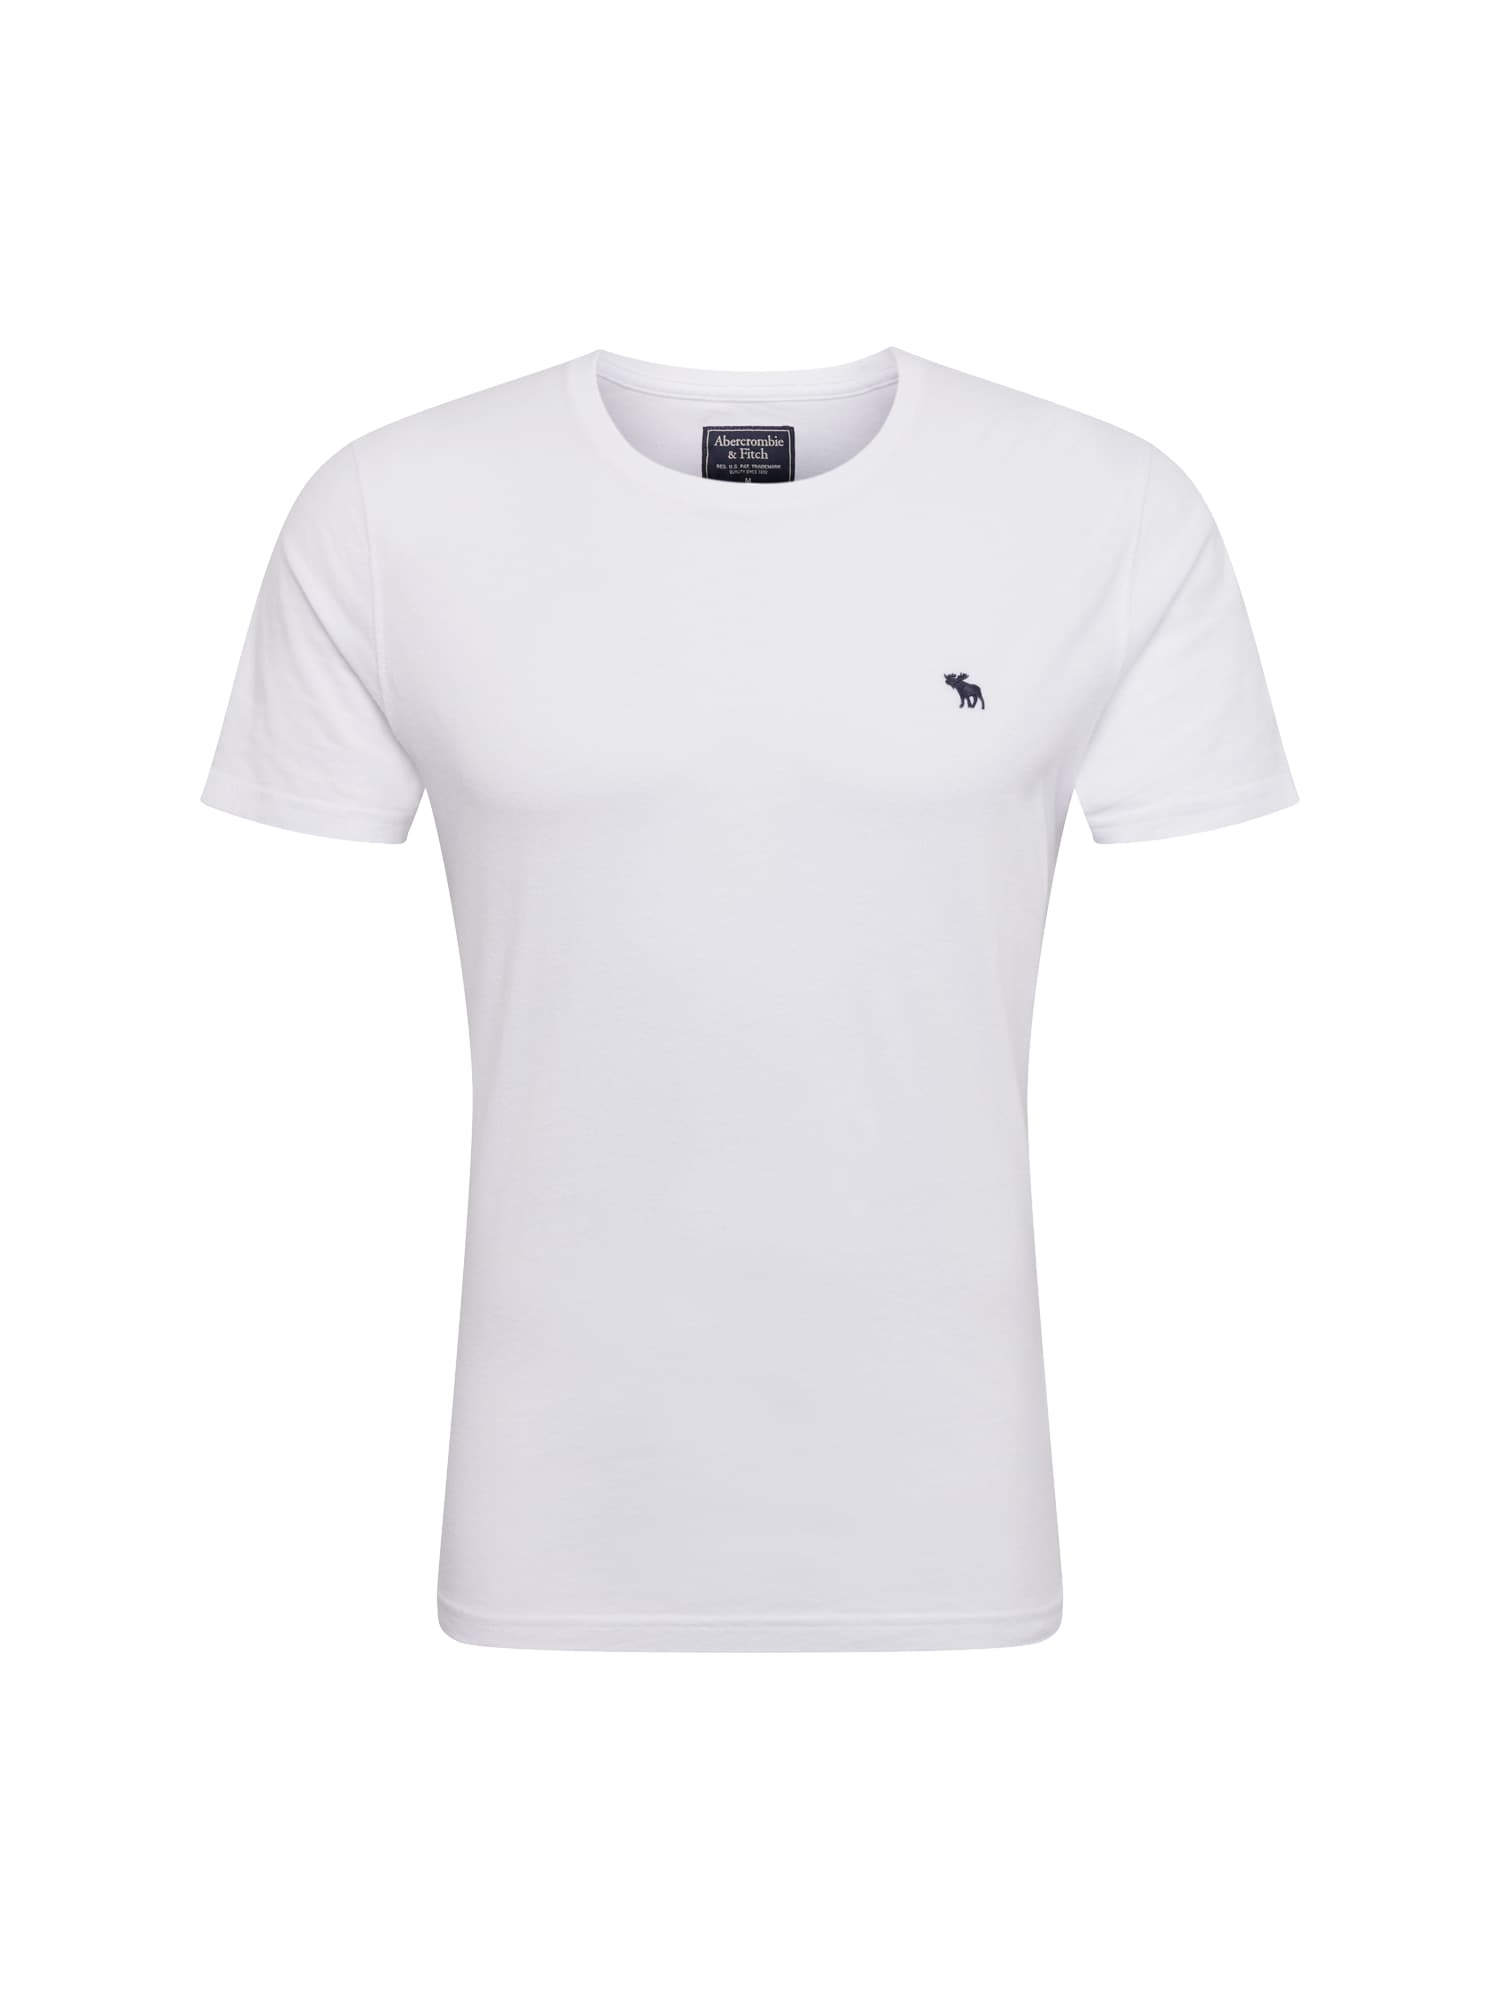 Abercrombie & Fitch Marškinėliai